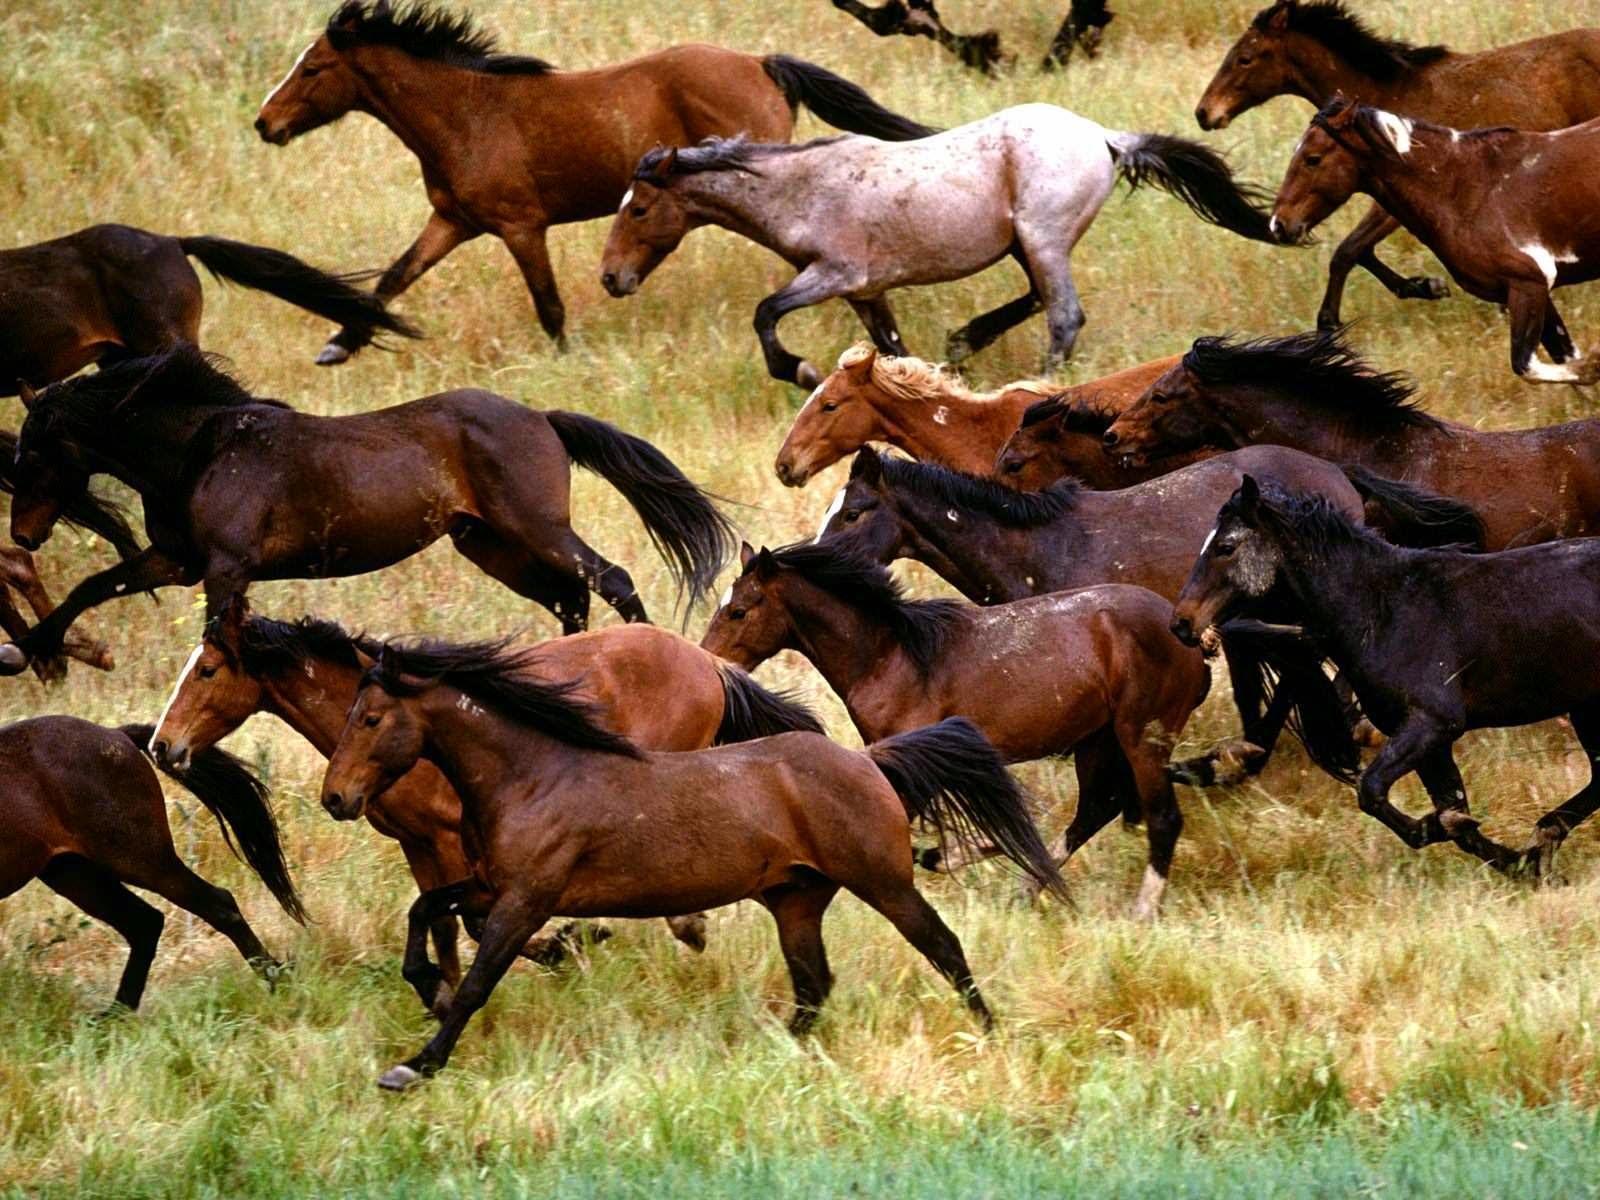 Fantastic   Wallpaper Horse Ultra Hd - wxp%2B(8)  Trends_6610082.jpg